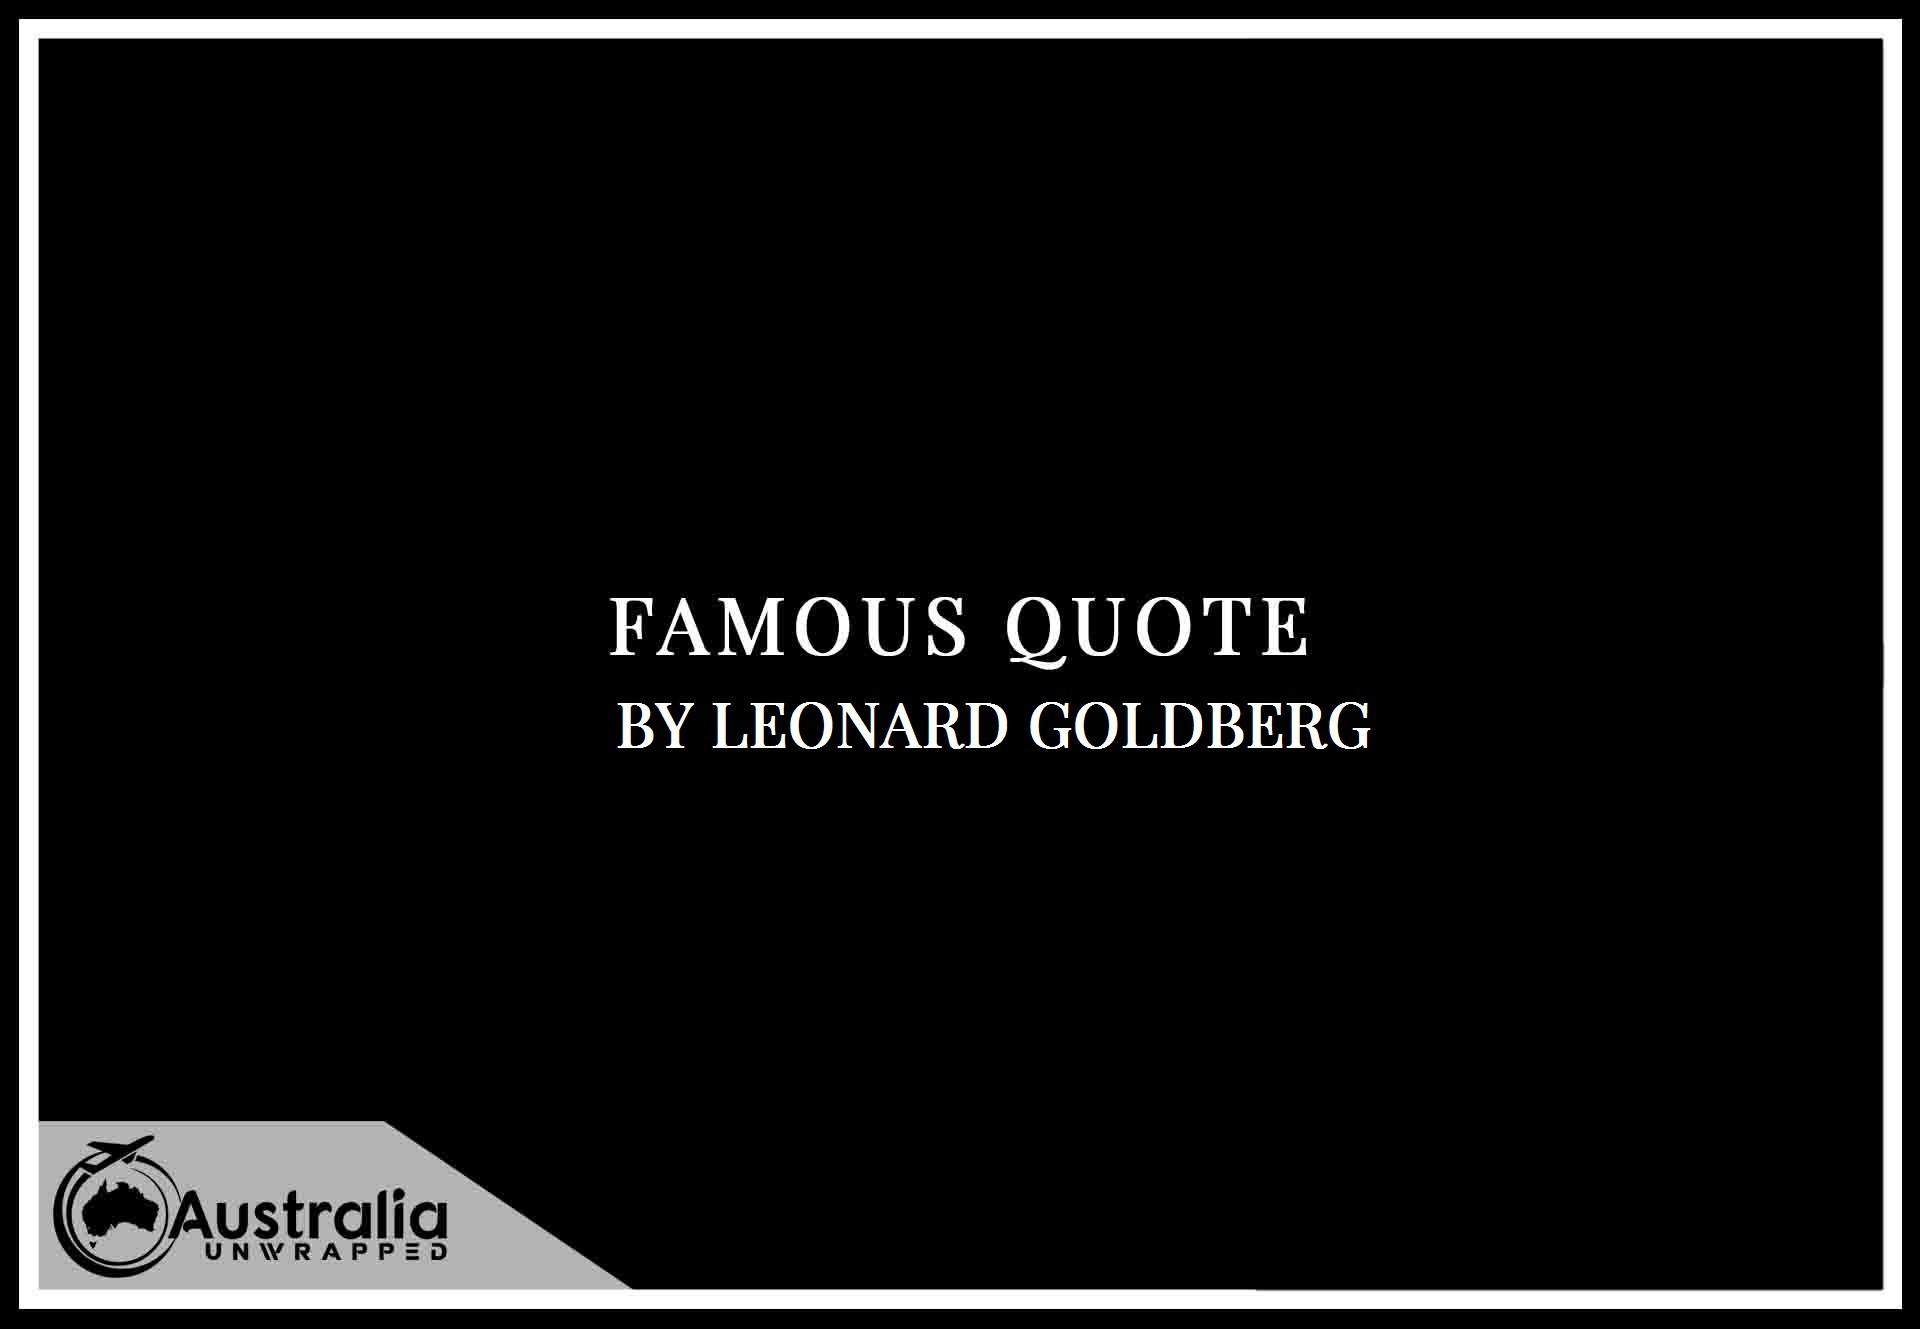 Leonardo Padura's Top 10 Popular and Famous Quotes